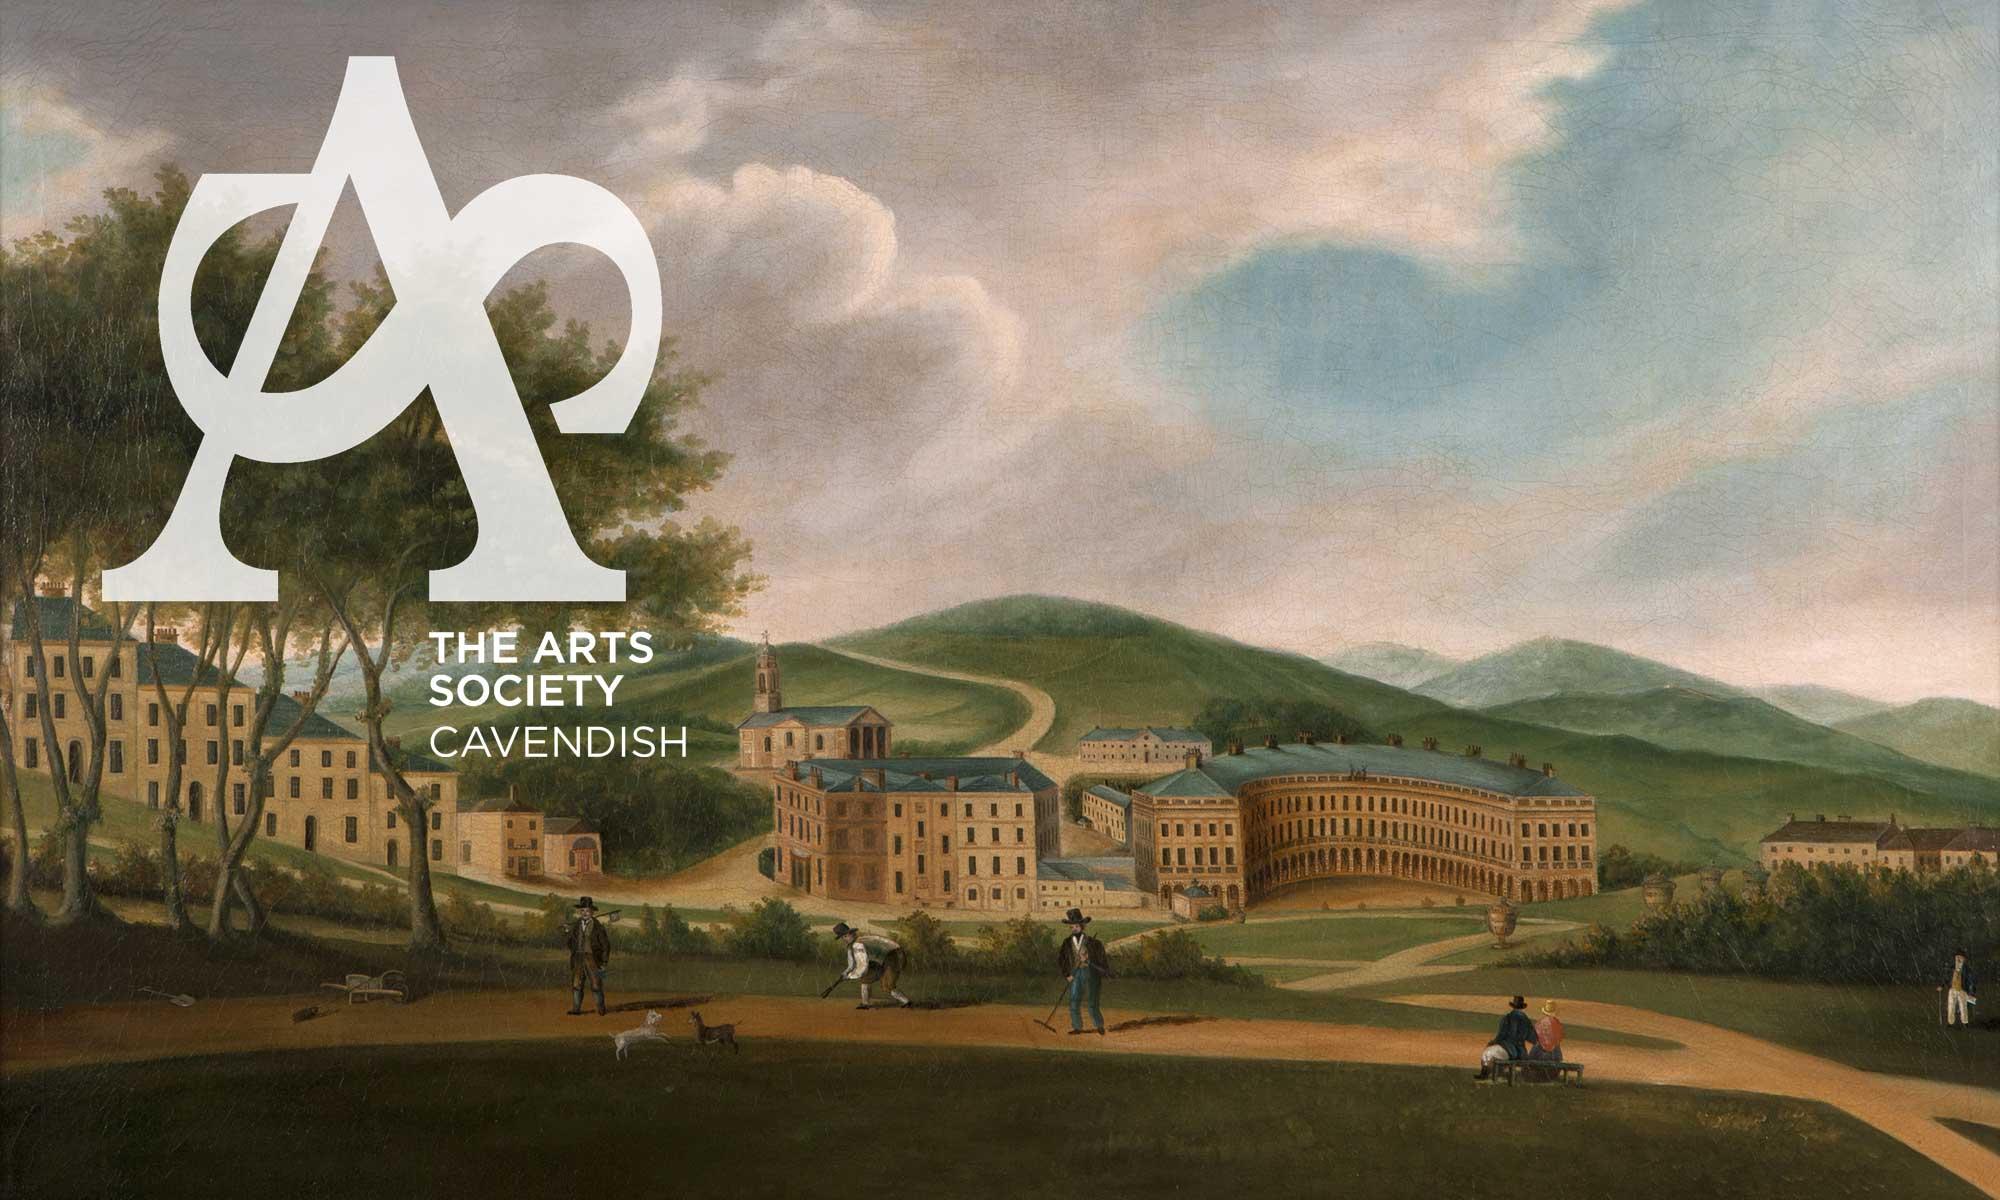 Arts Society Cavendish